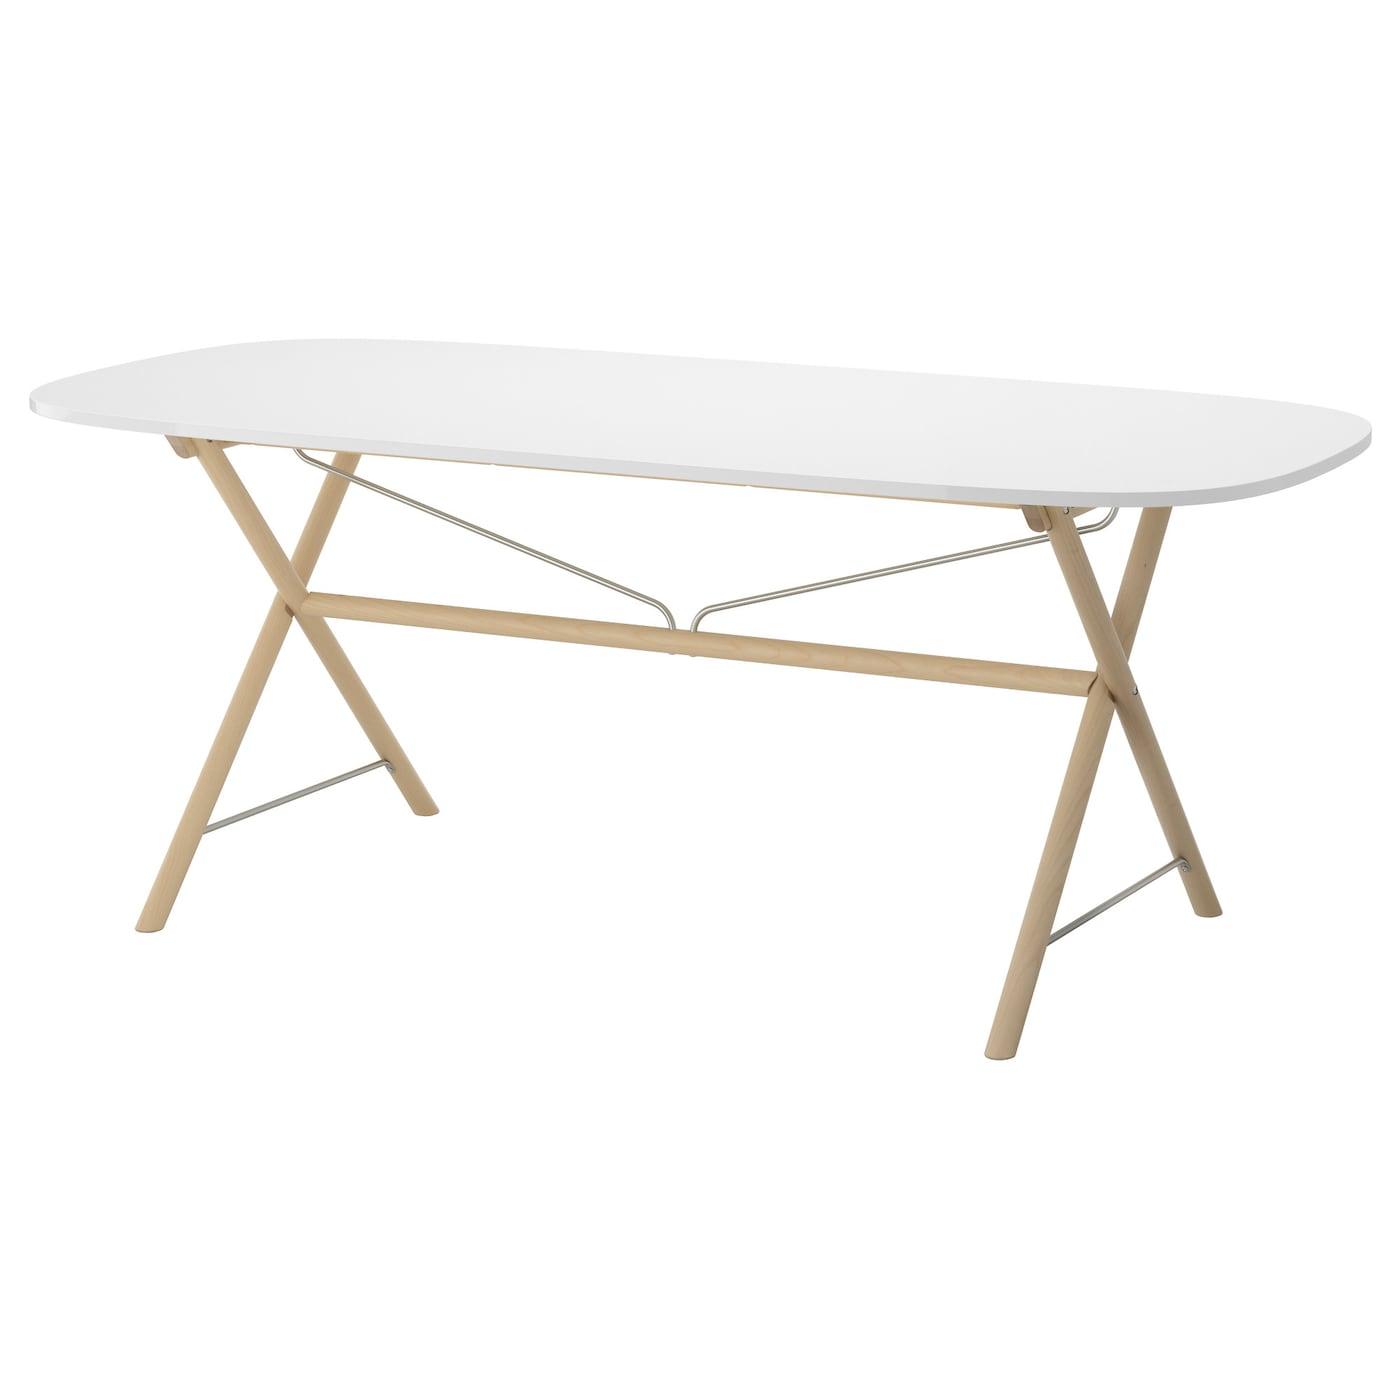 OPPEBY Table Whitedalshult birch 185x90 cm IKEA : oppeby table white dalshult birch0436766pe590353s5 from www.ikea.com size 2000 x 2000 jpeg 142kB